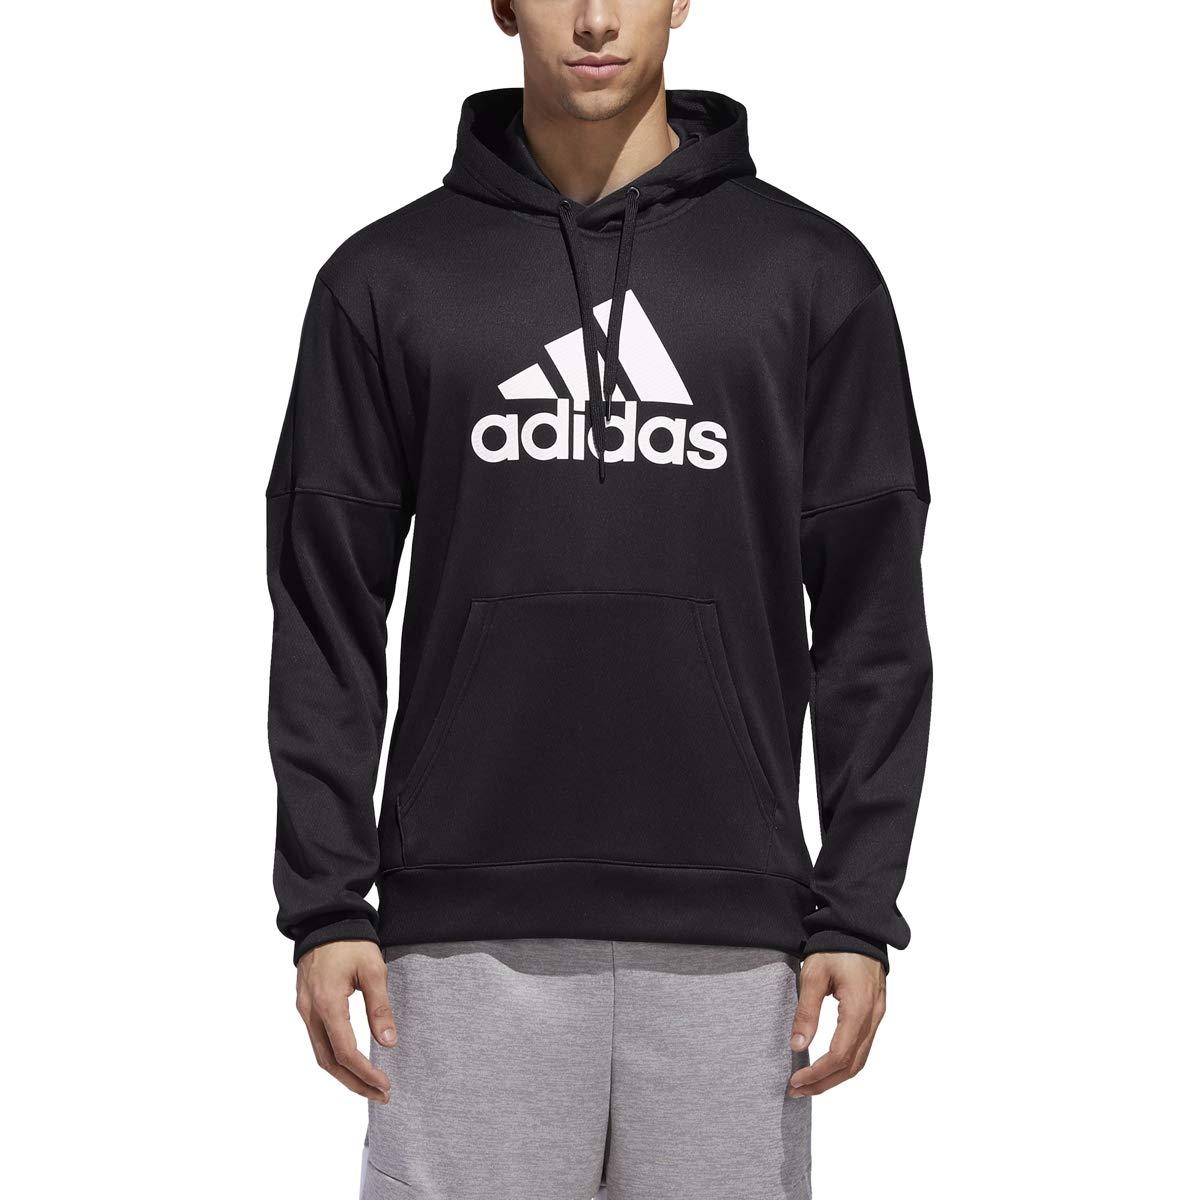 adidas Team Issue Badge of Sport Hoodie - Men's Multi-Sport XLT Black by adidas